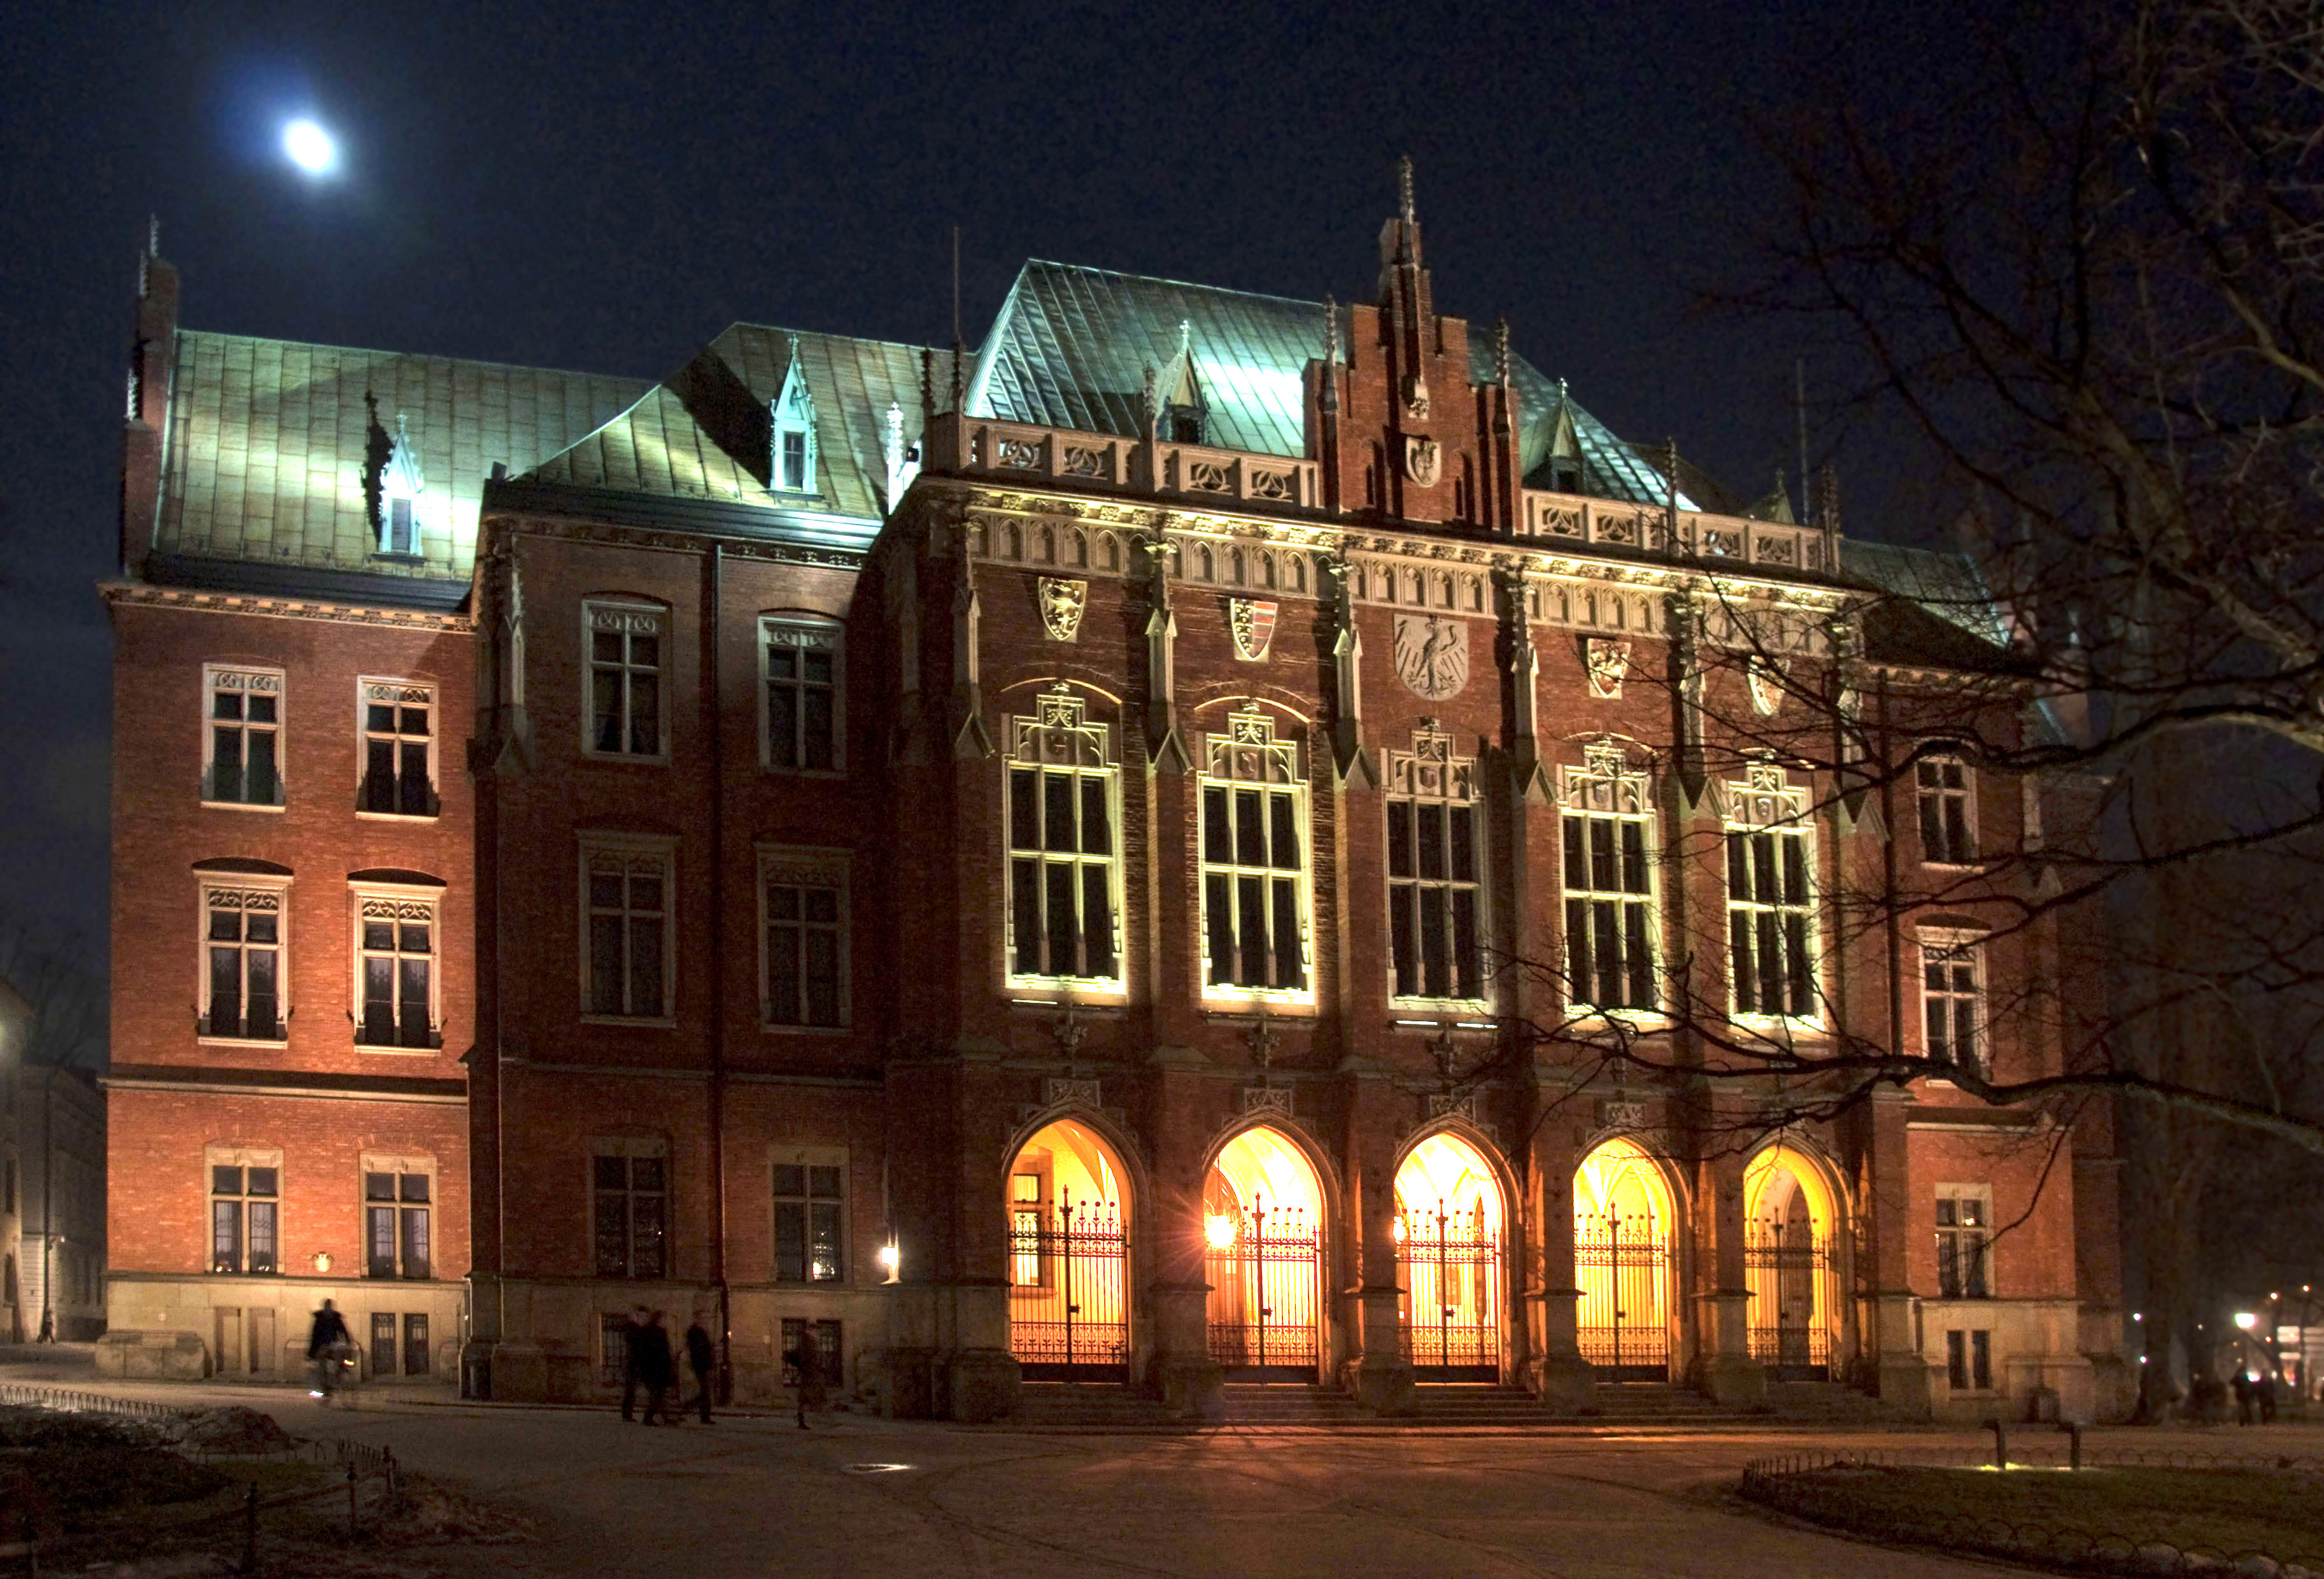 File:Collegium Novum UJ 02 Krakow.jpg - Wikipedia, the free ...